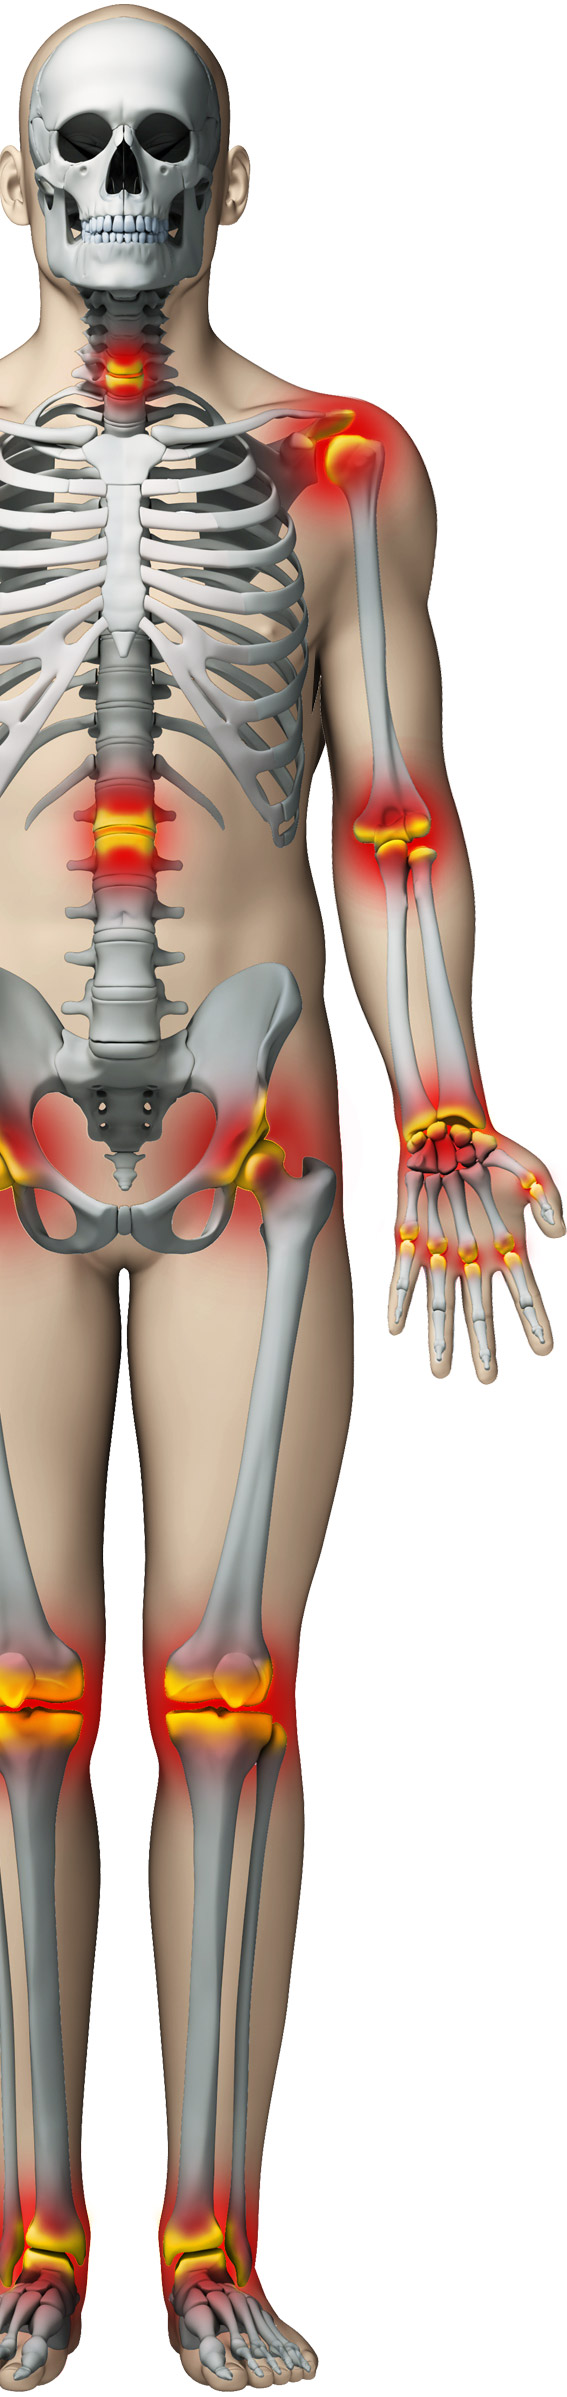 cum să tratezi artroza durerii de genunchi